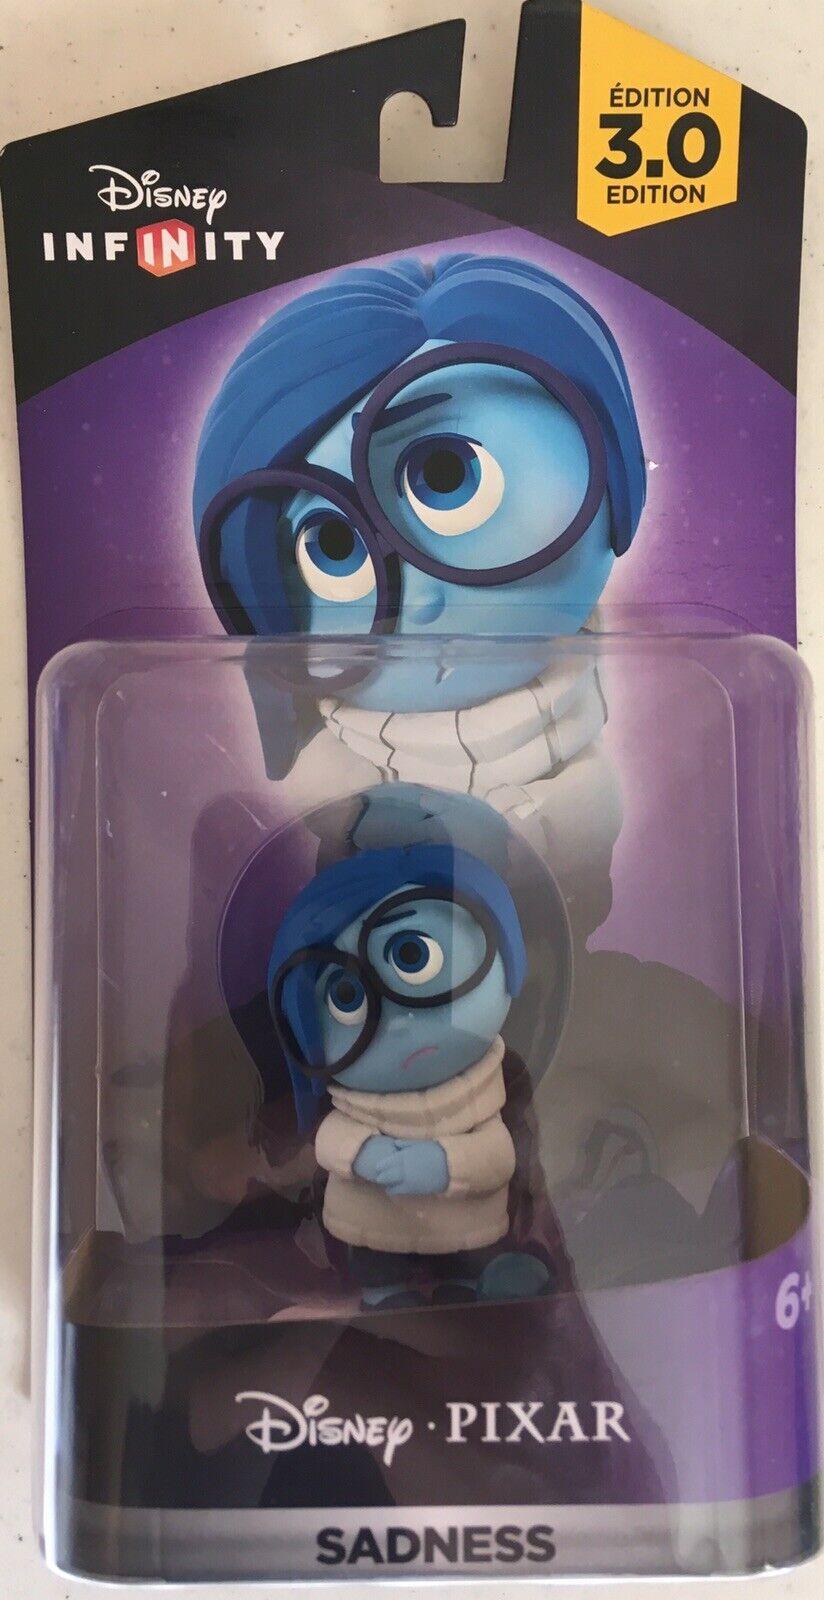 Disney Infinity Edition 3 0 Sadness - Factory Figure LOOK